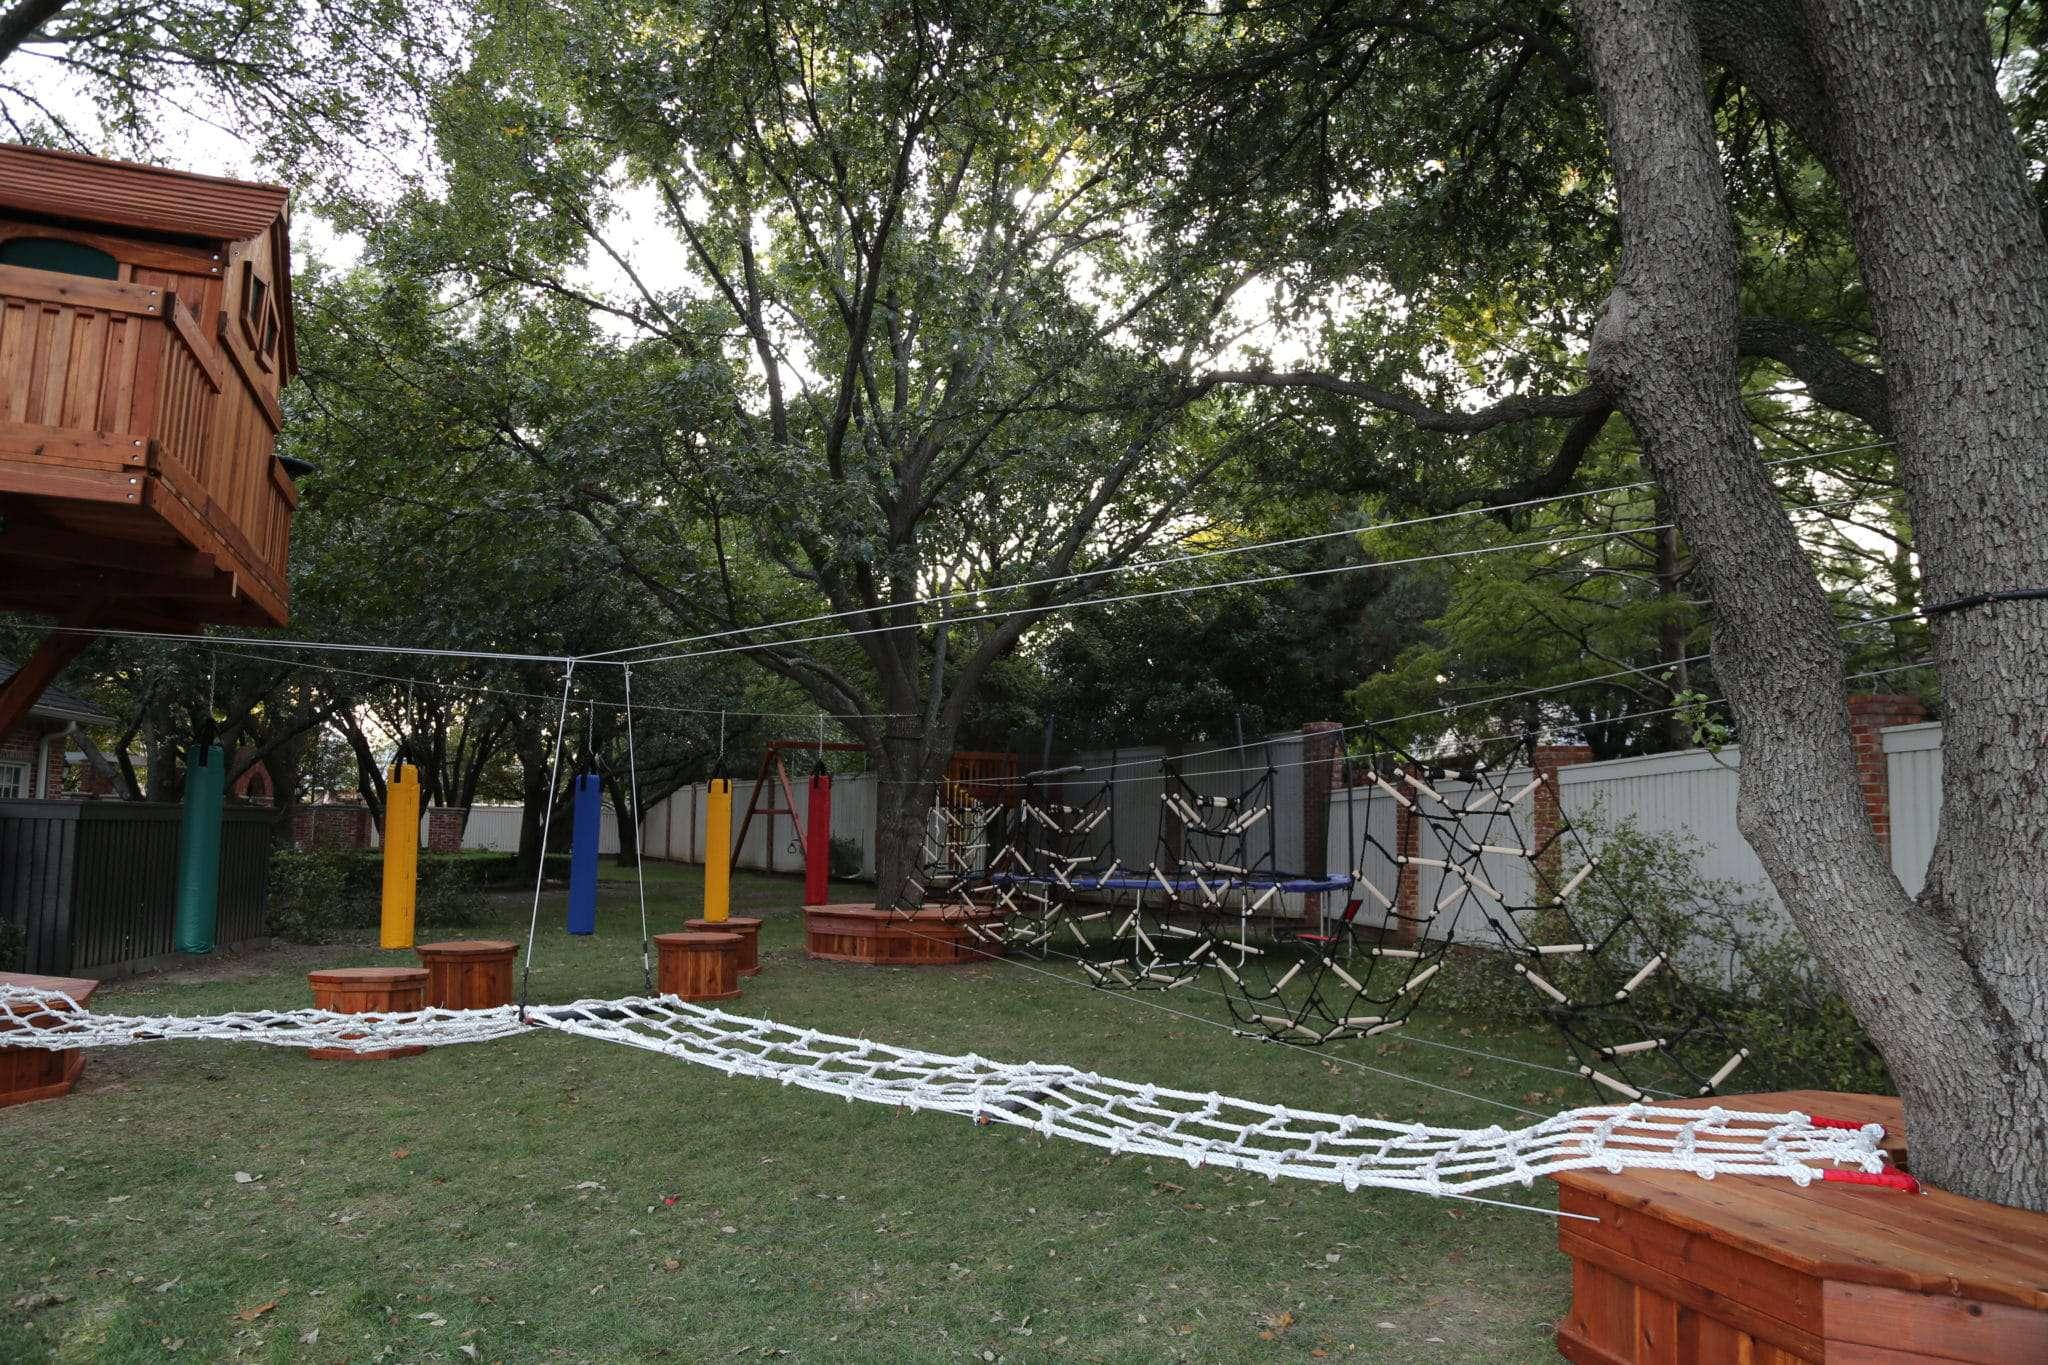 go play outside ninja warrior style backyard fun factory